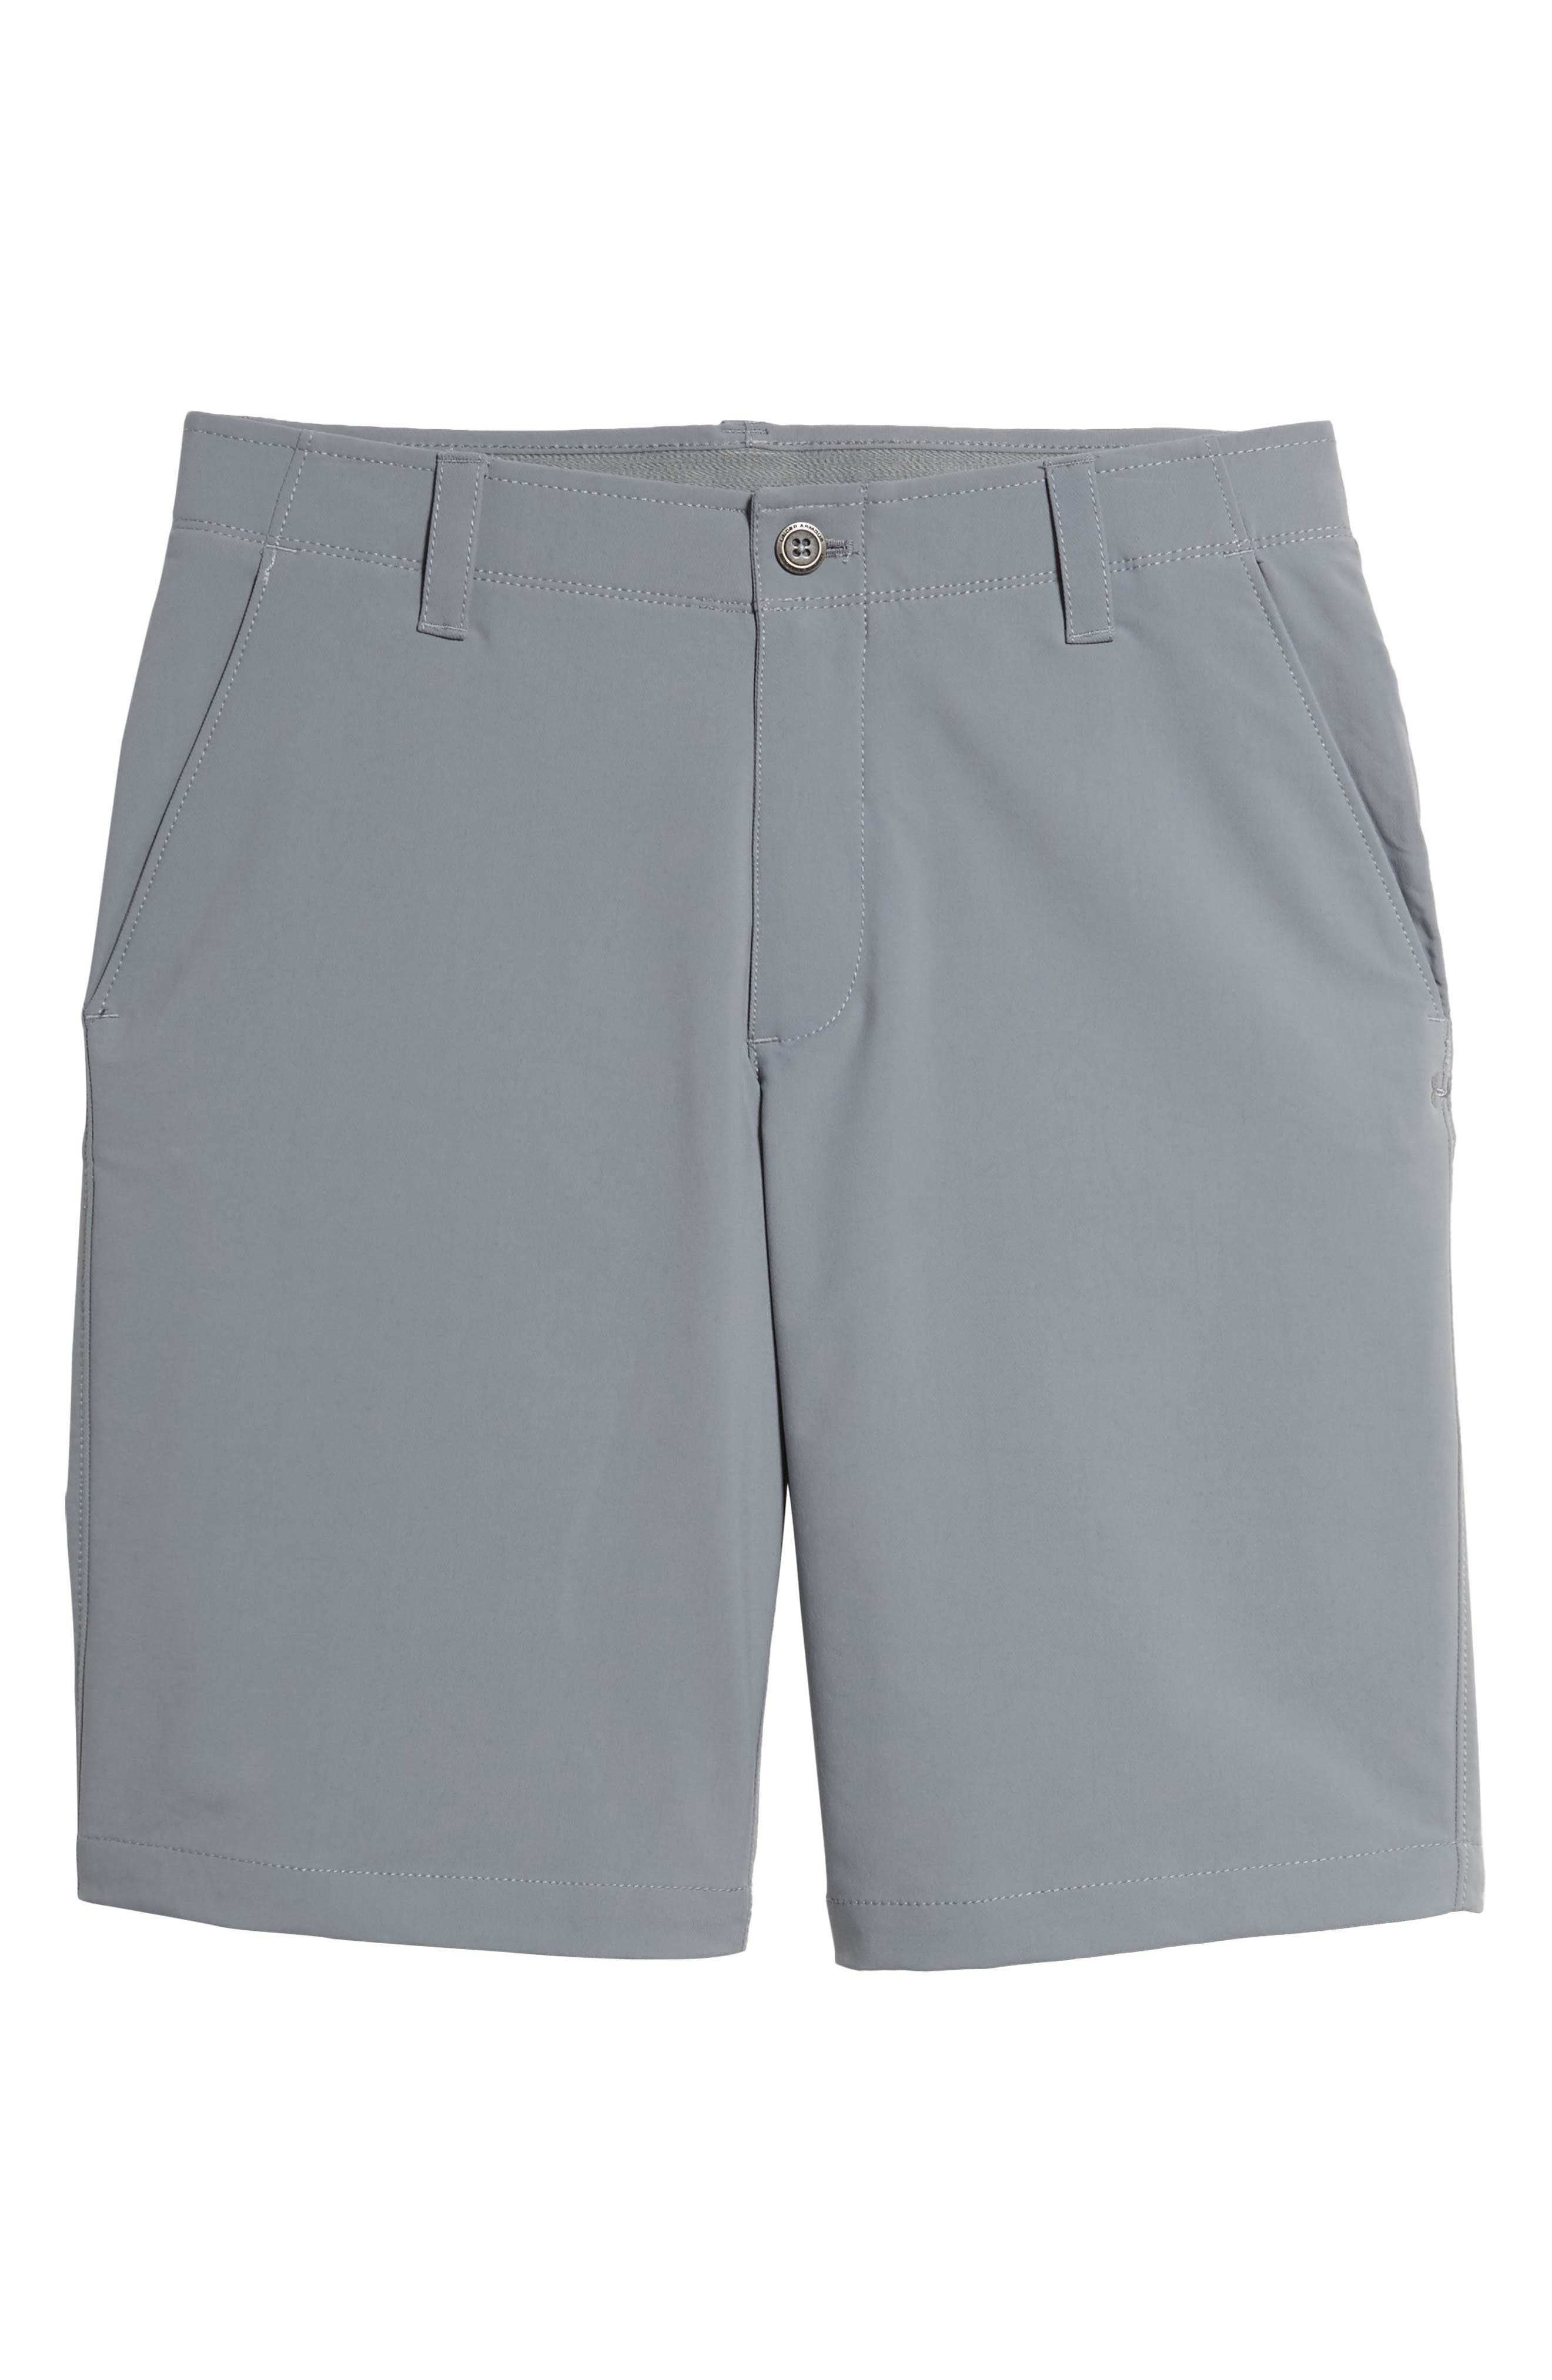 'Matchplay' Moisture Wicking Golf Shorts,                             Main thumbnail 1, color,                             Steel